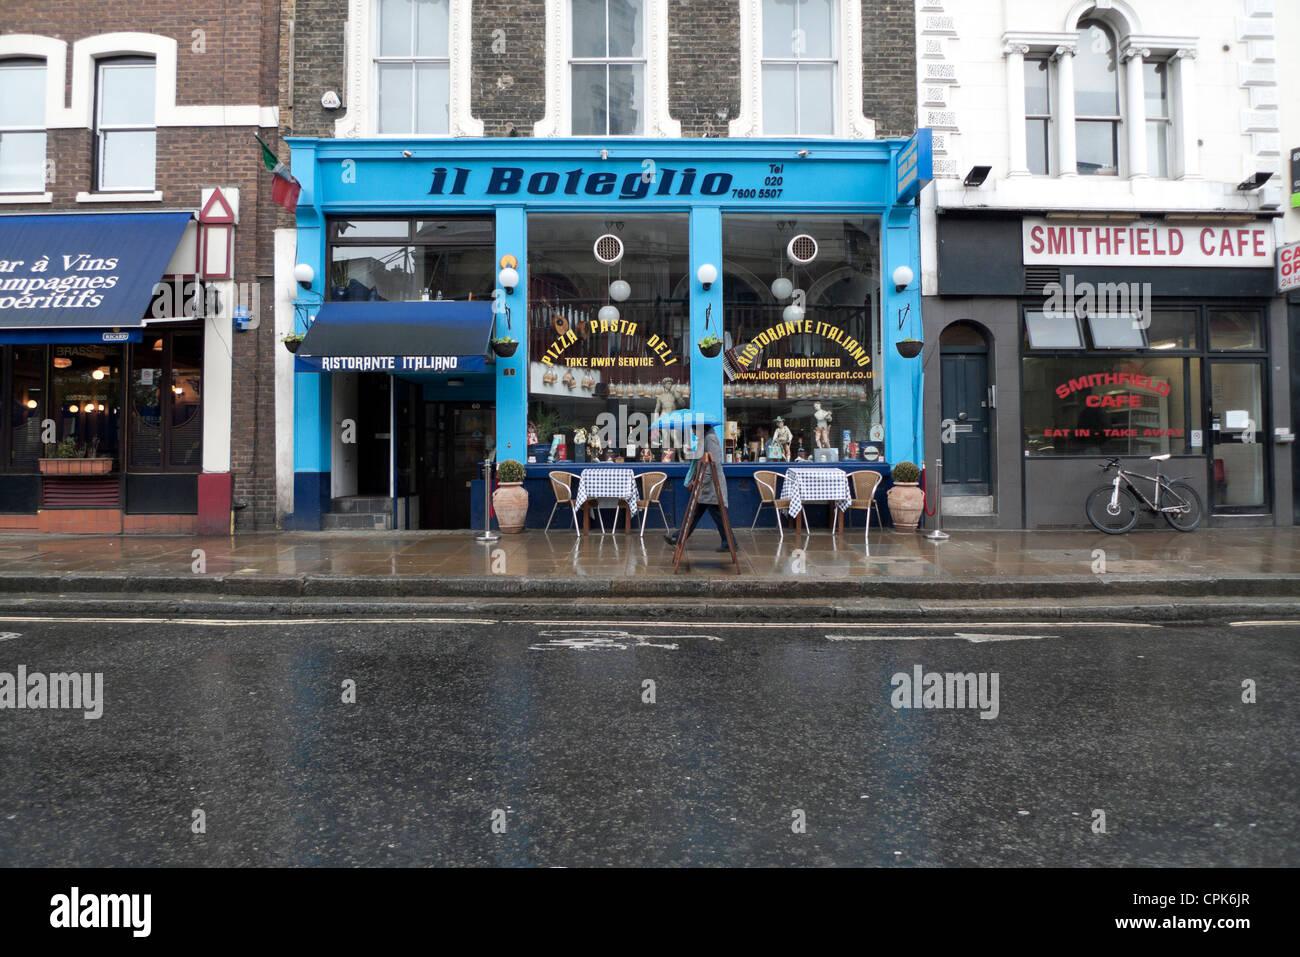 Italian restaurant exterior - Il Boteglio Italian Restaurant Exterior Long Lane Smithfield London England Uk Kathy Dewitt Stock Image